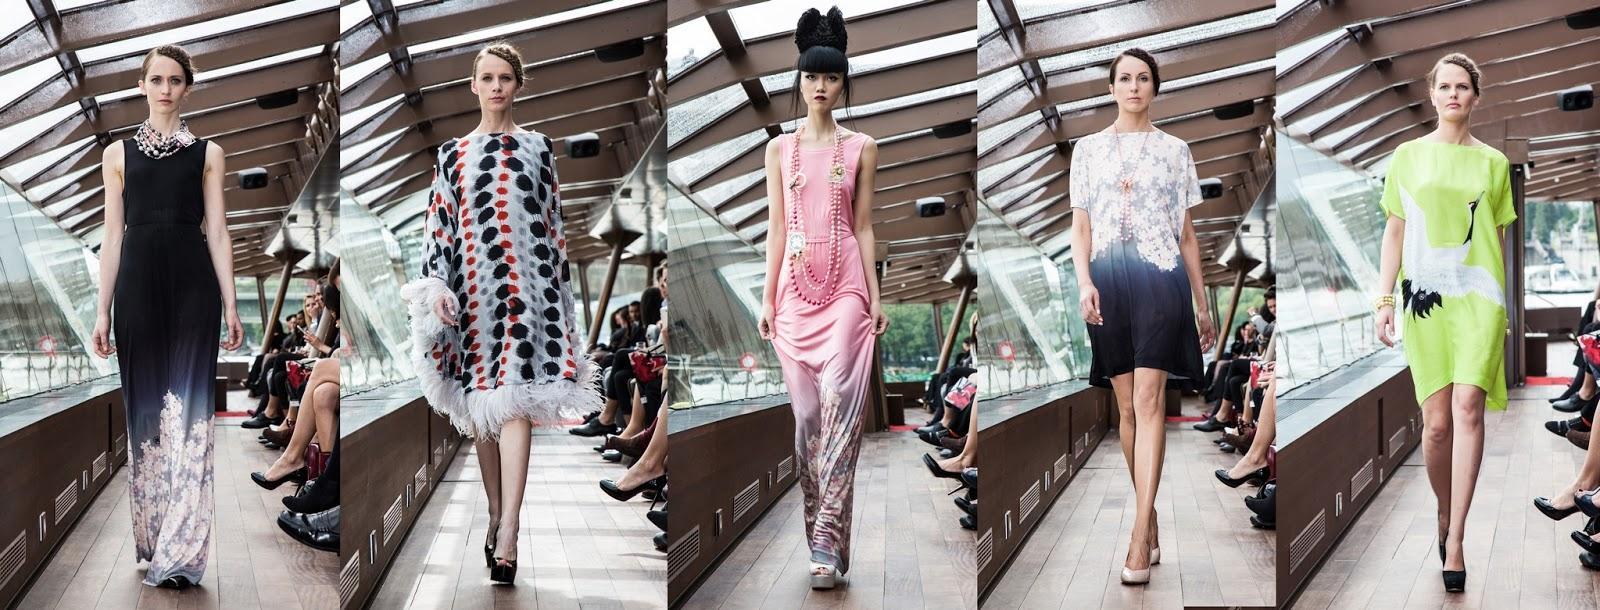 WTFSG-j-summer-fashion-show-on-river-seine-paris-6